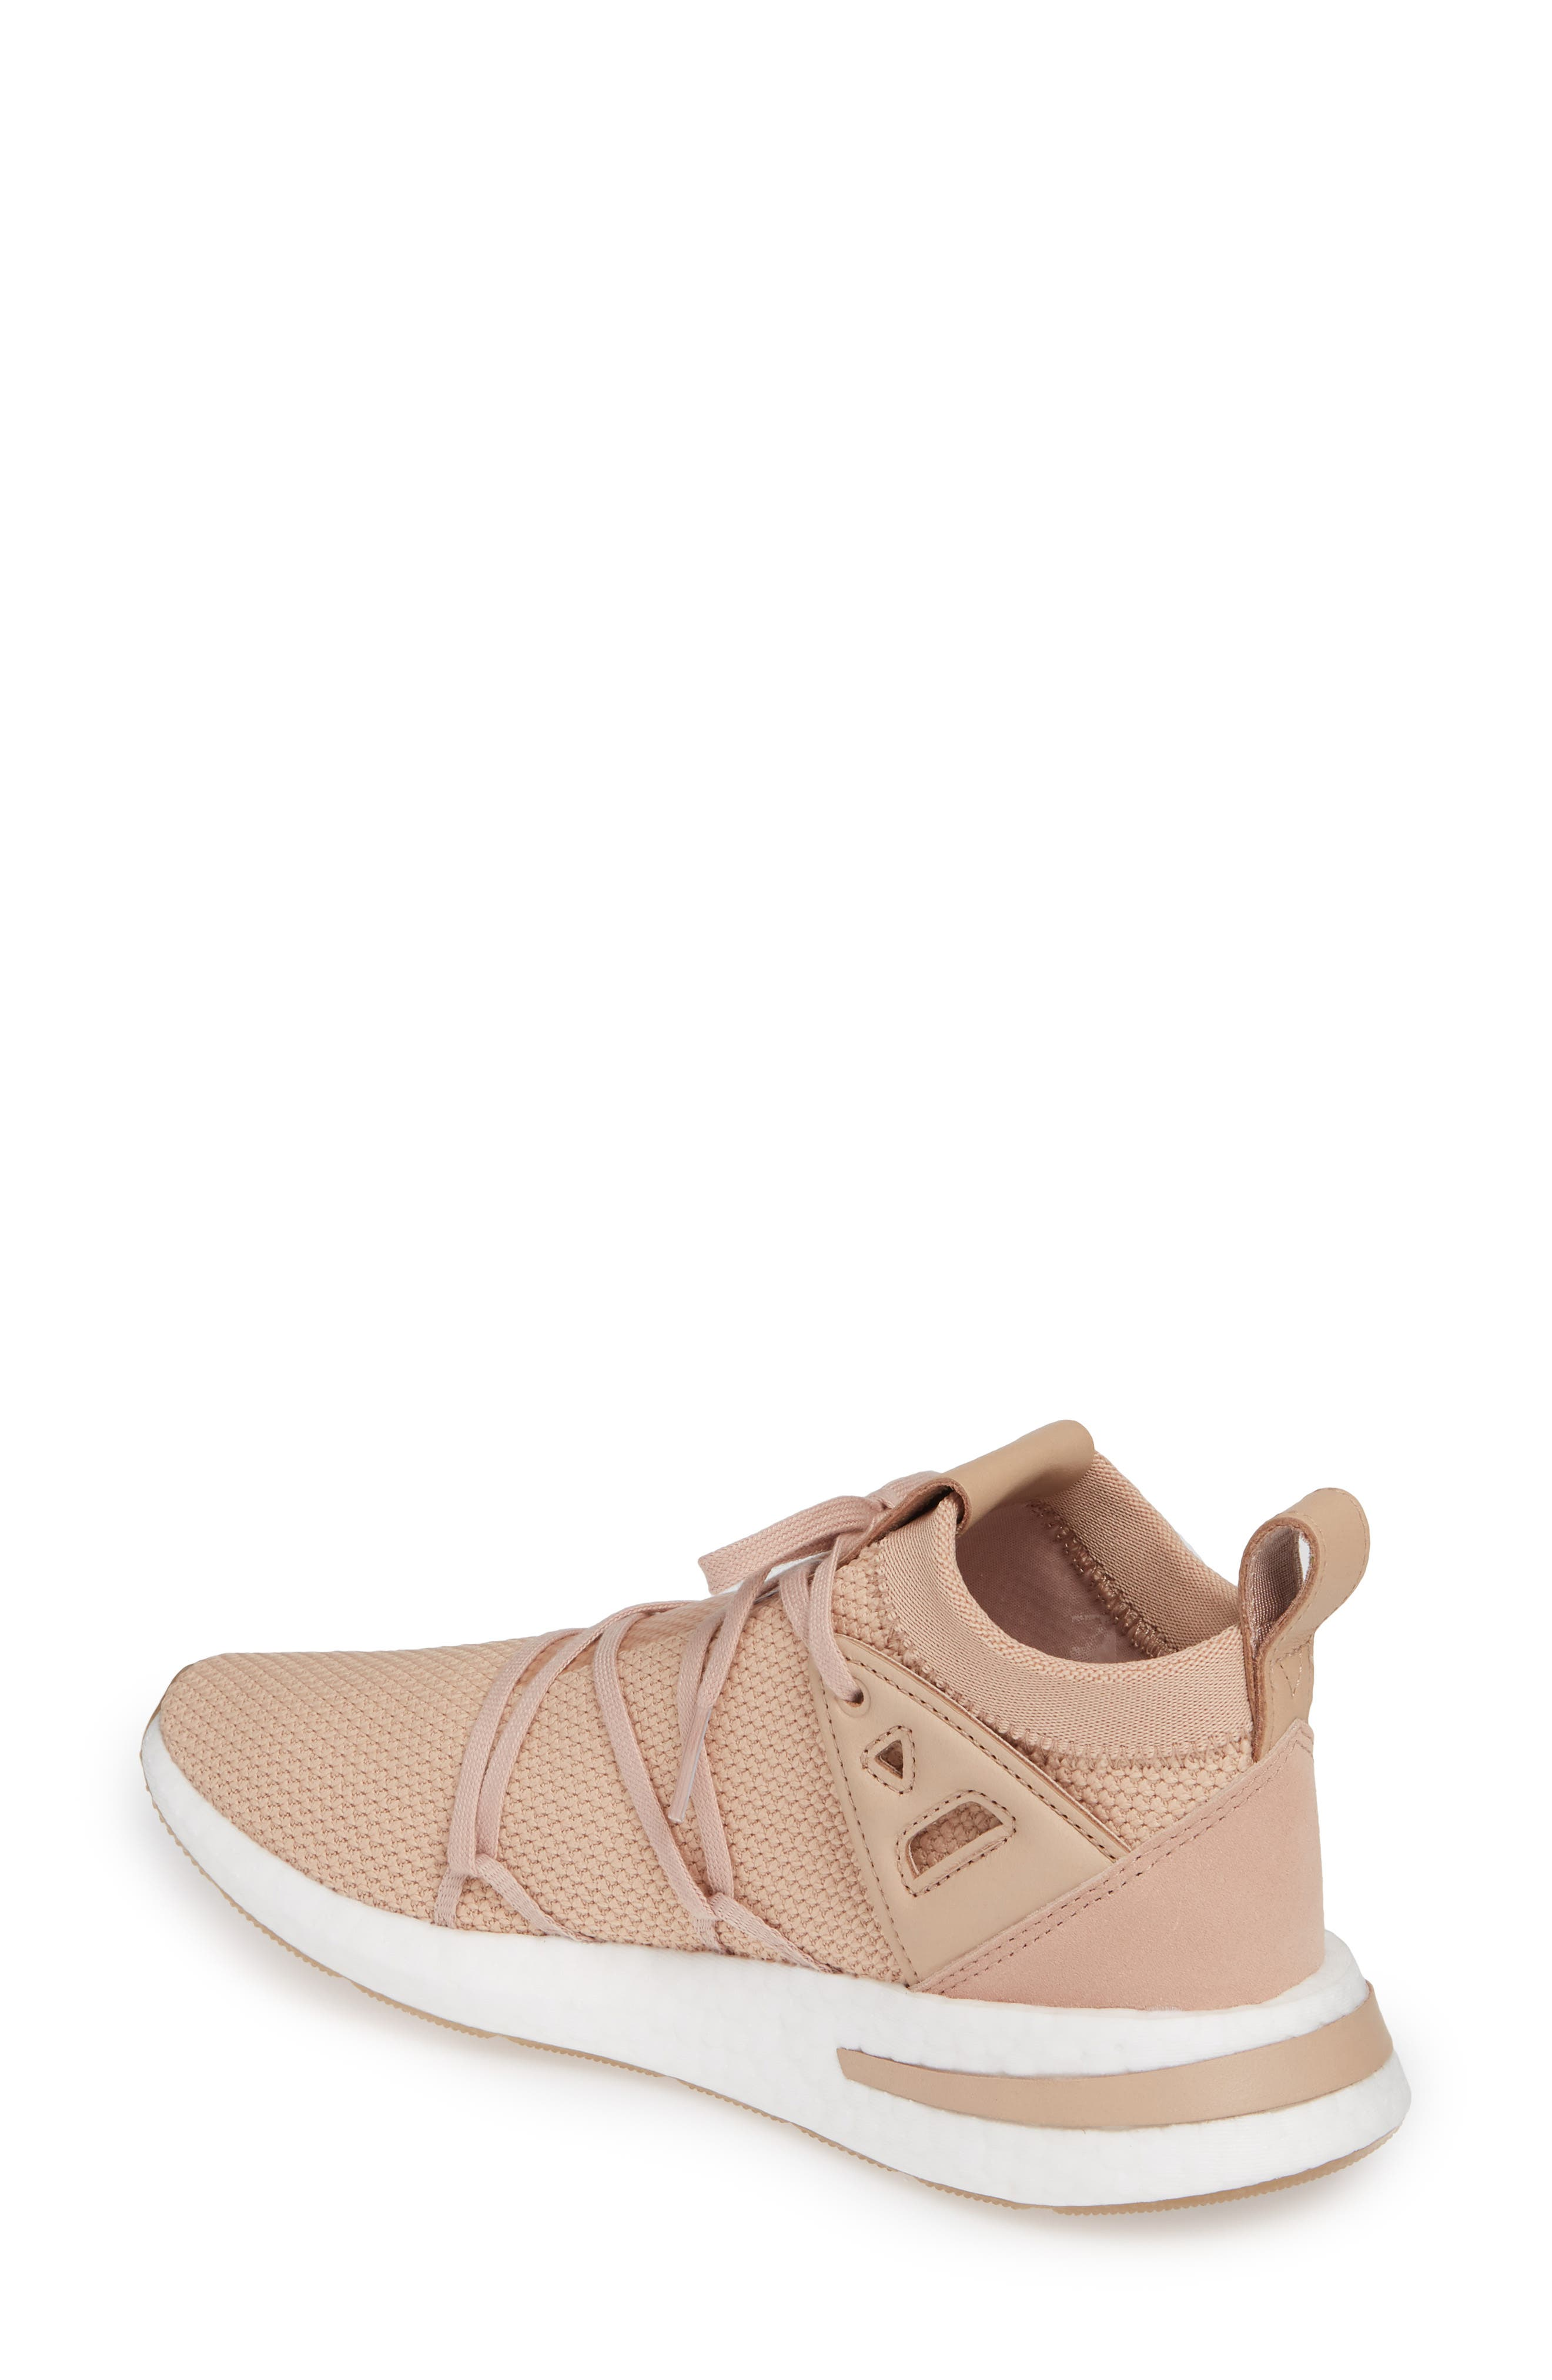 ,                             Arkyn Primeknit Sneaker,                             Alternate thumbnail 32, color,                             250